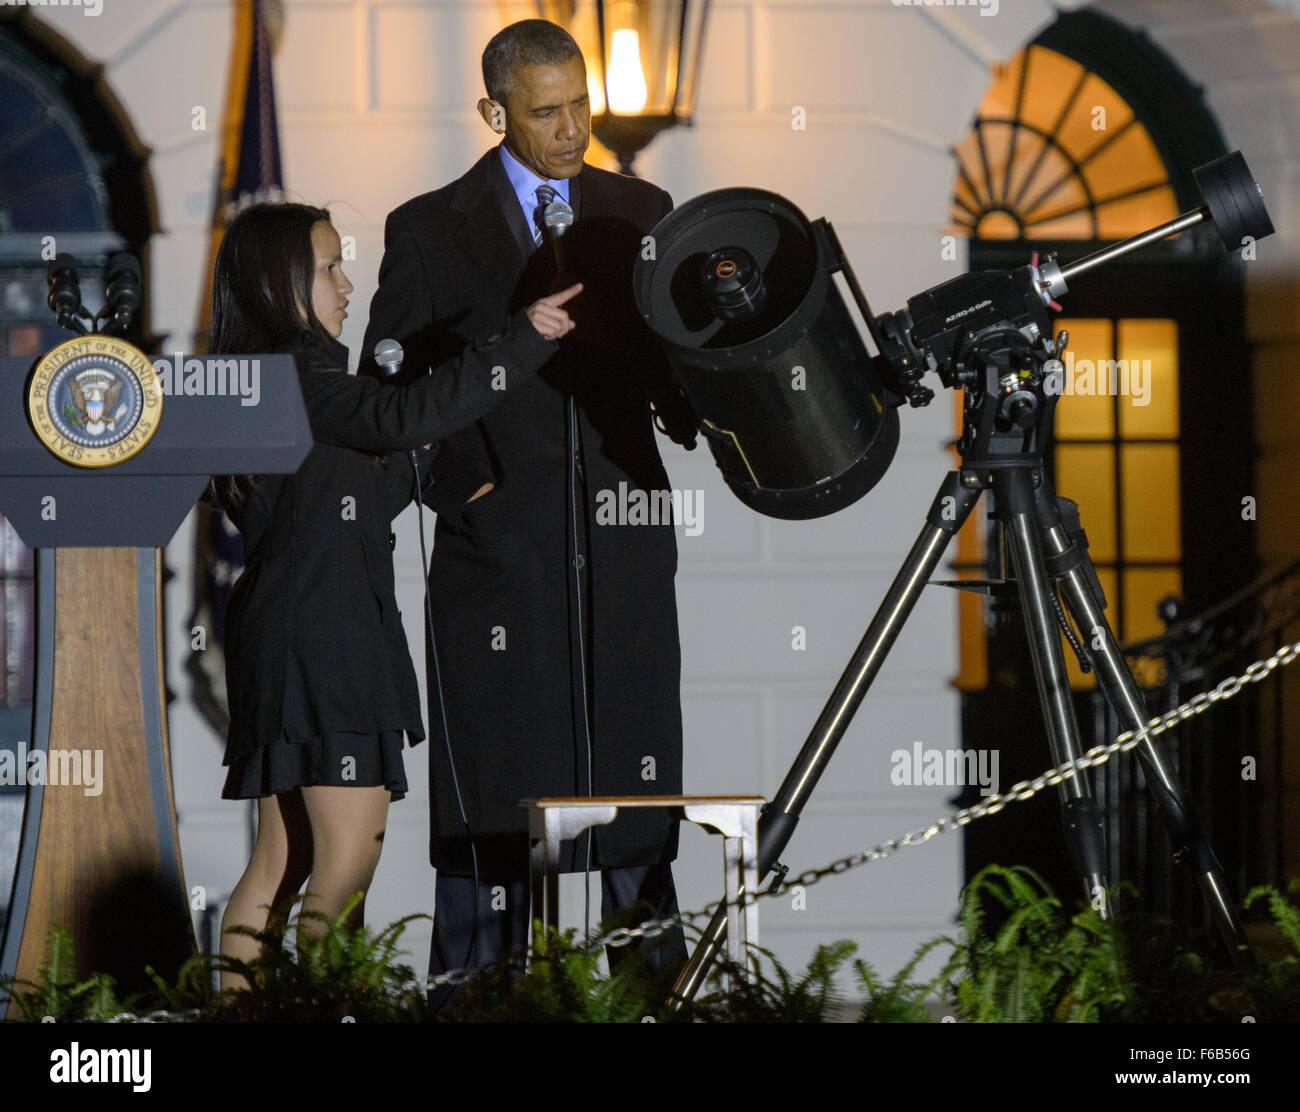 Agatha Sofia Alvarez-Bareiro, a student from Brooklyn, NY, left, points out parts of a telescope to President Barack - Stock Image